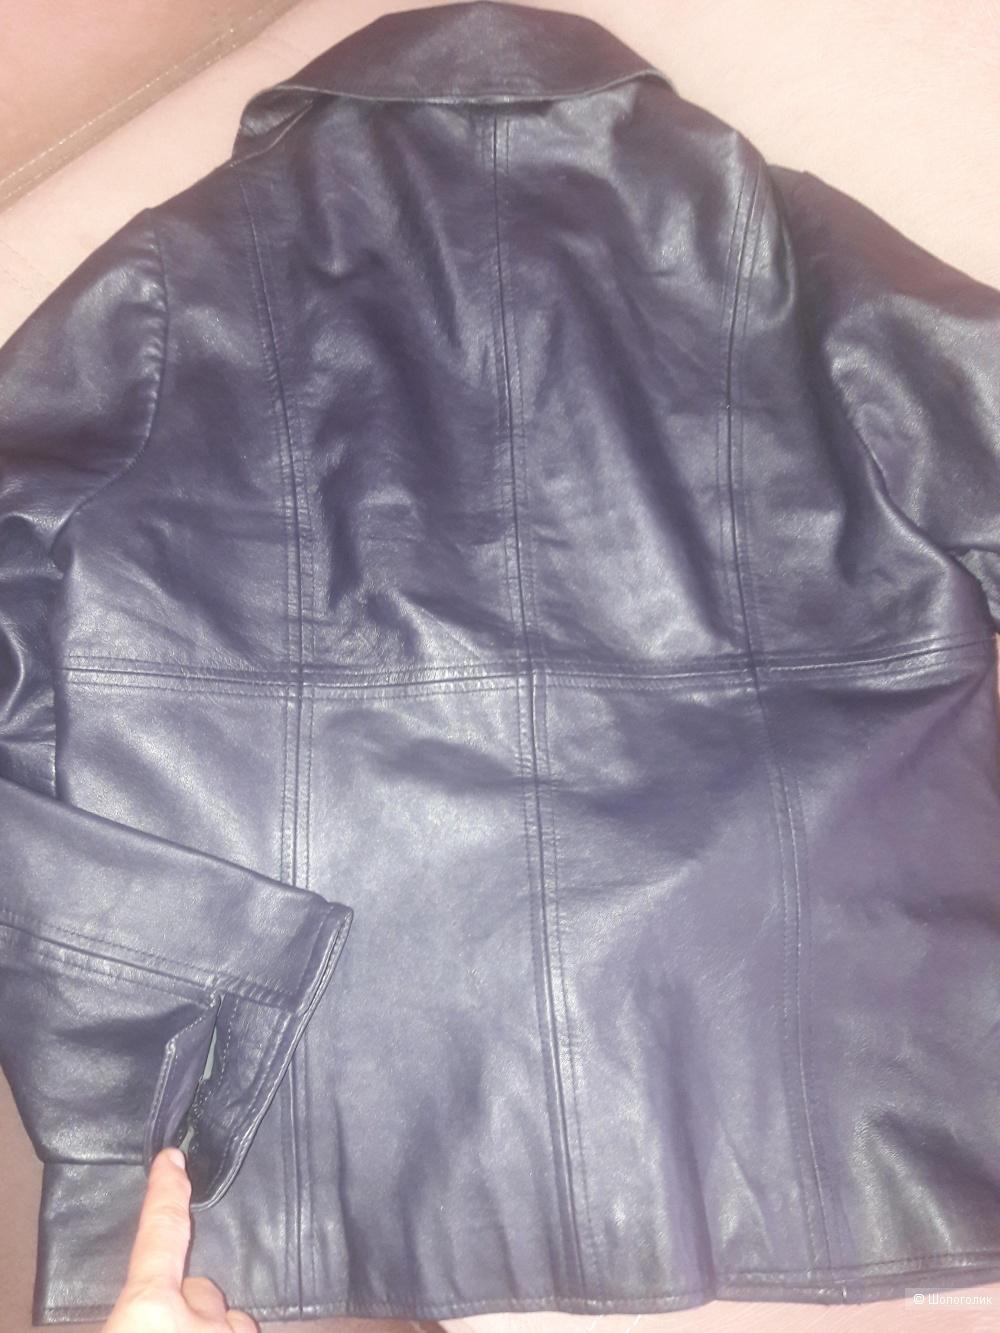 Кожаная куртка Cruse 46-48 размера